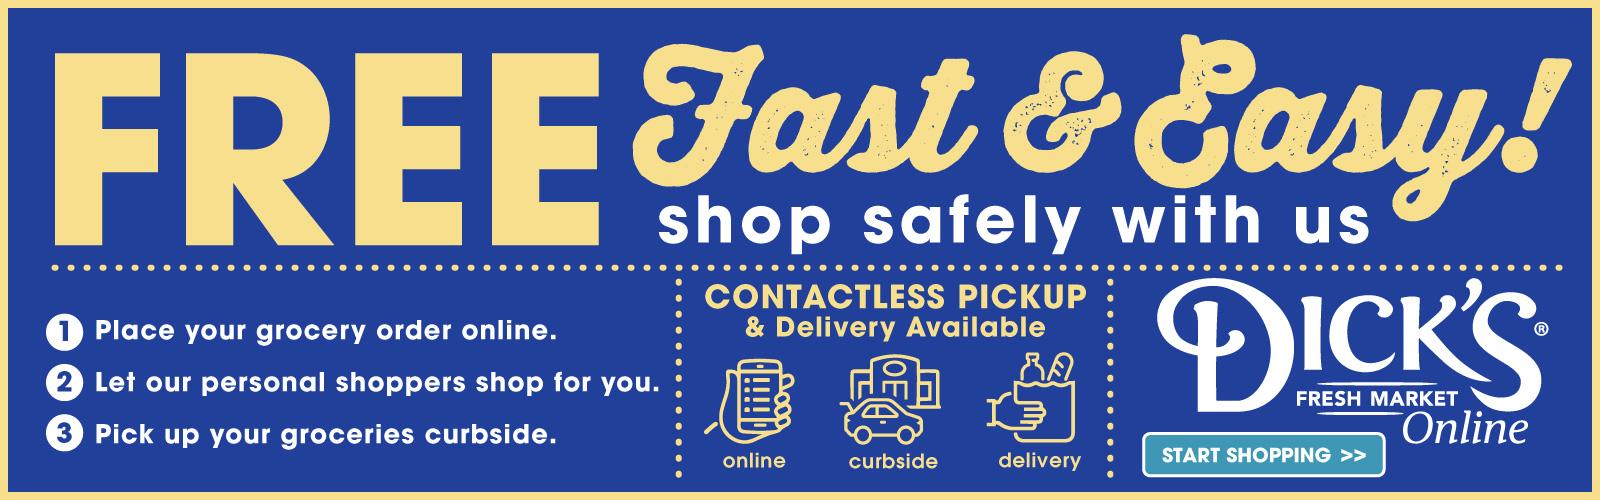 Free, Fast, & Easy!